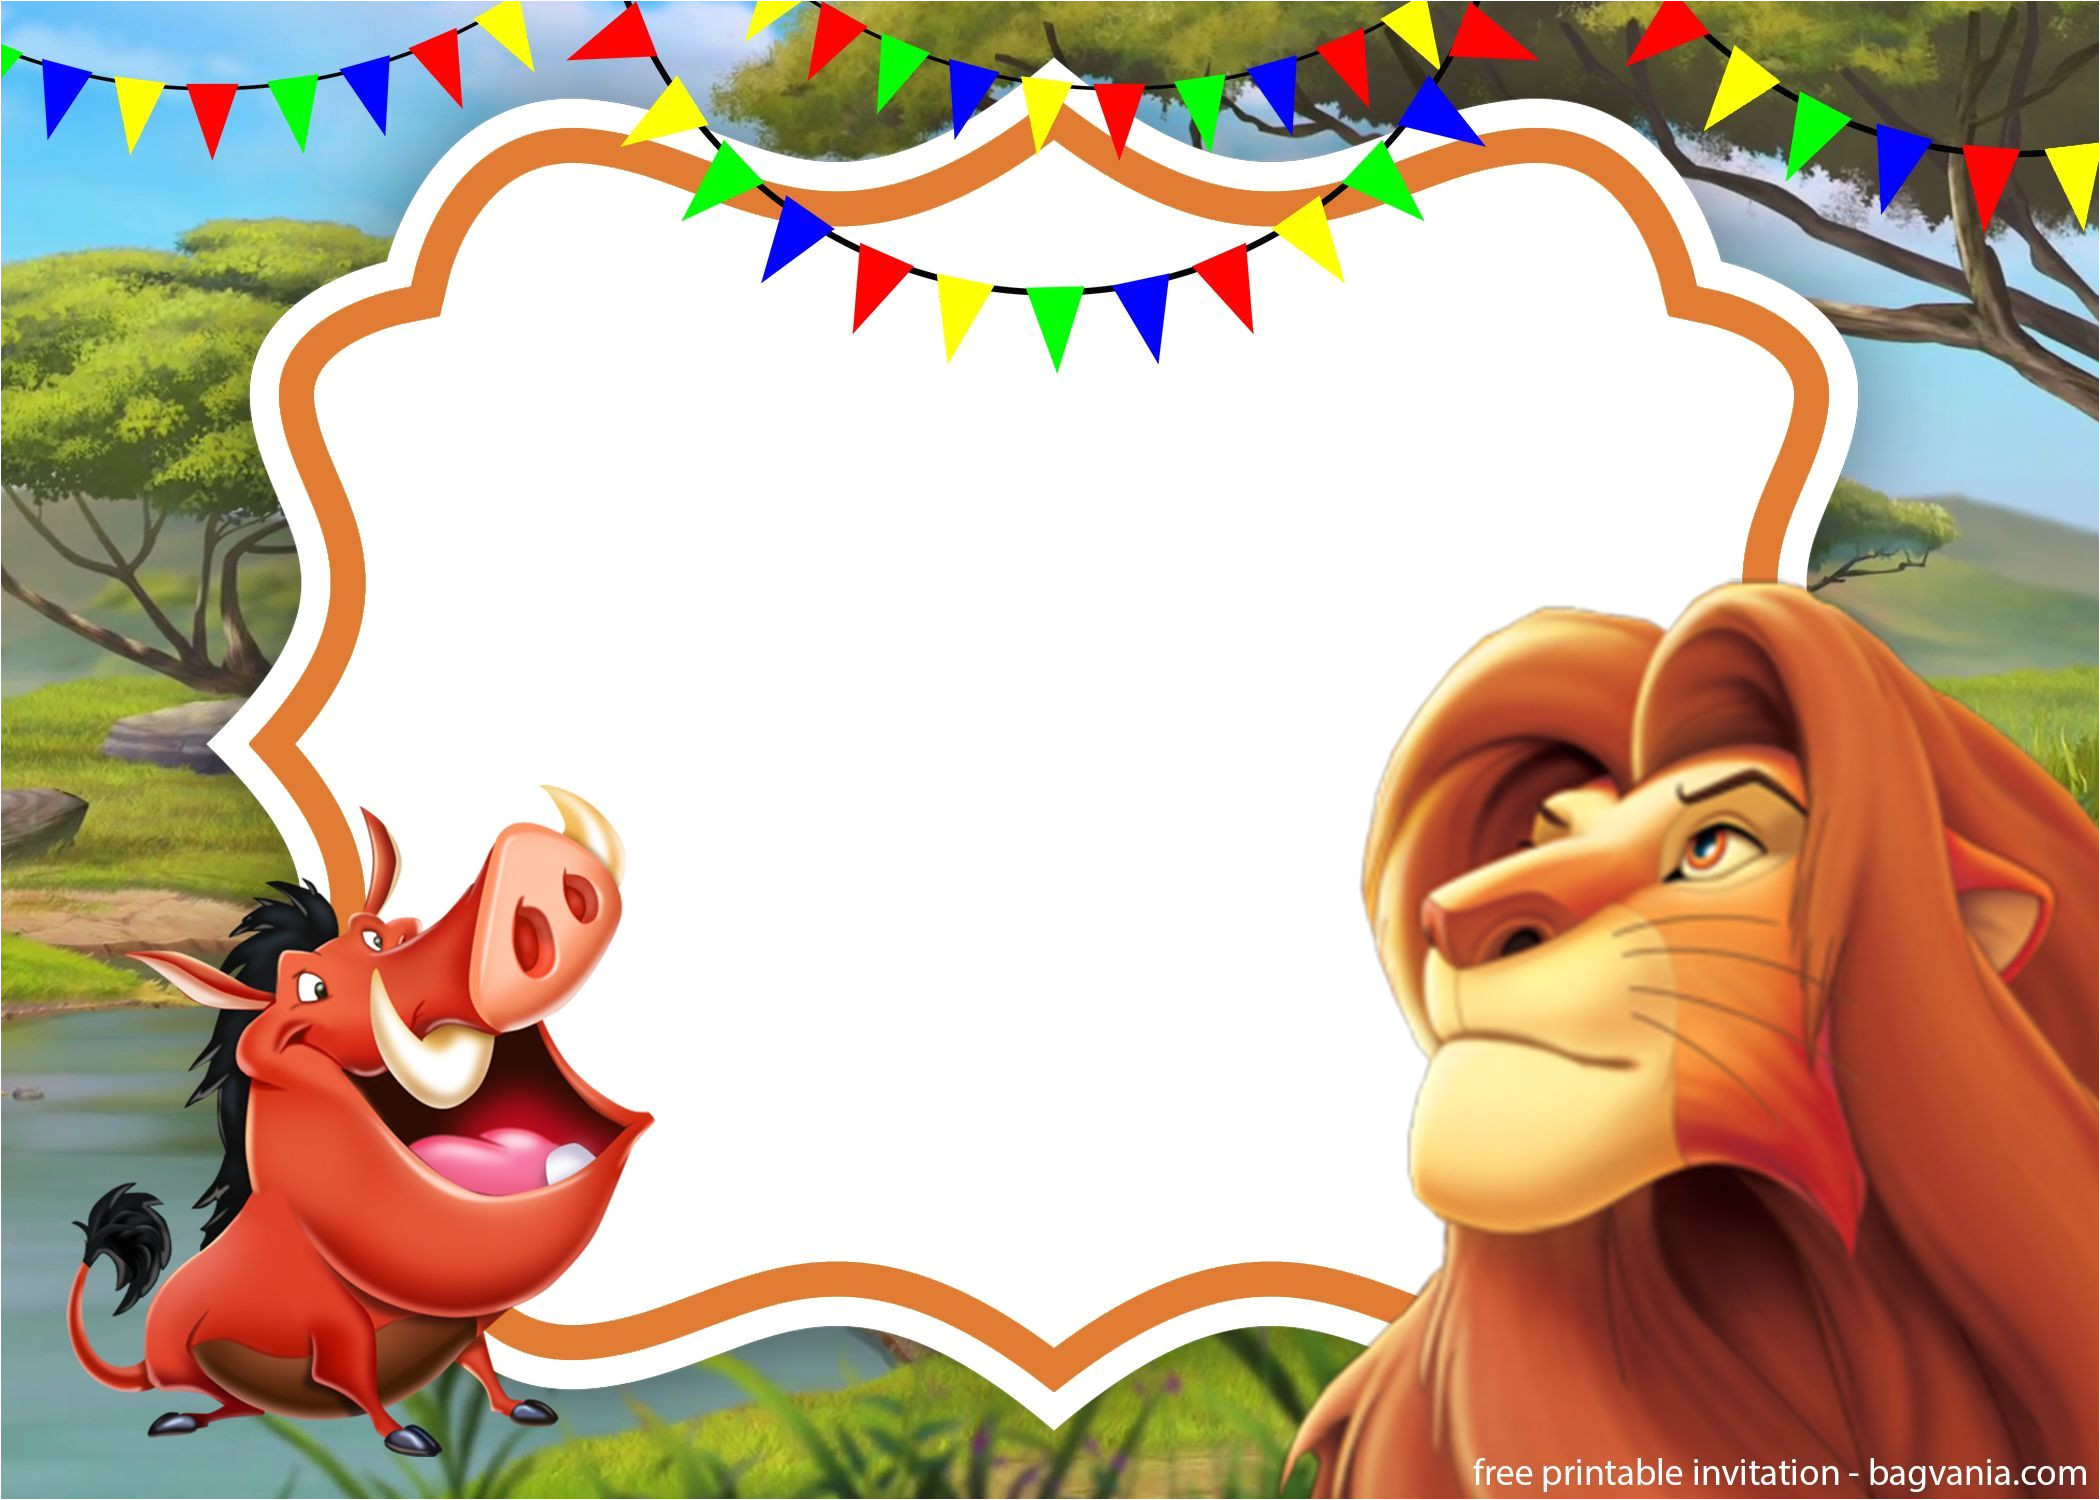 Free Lion King Birthday Invitation Template Simba Lion King Invitation Template Perfect for Parties